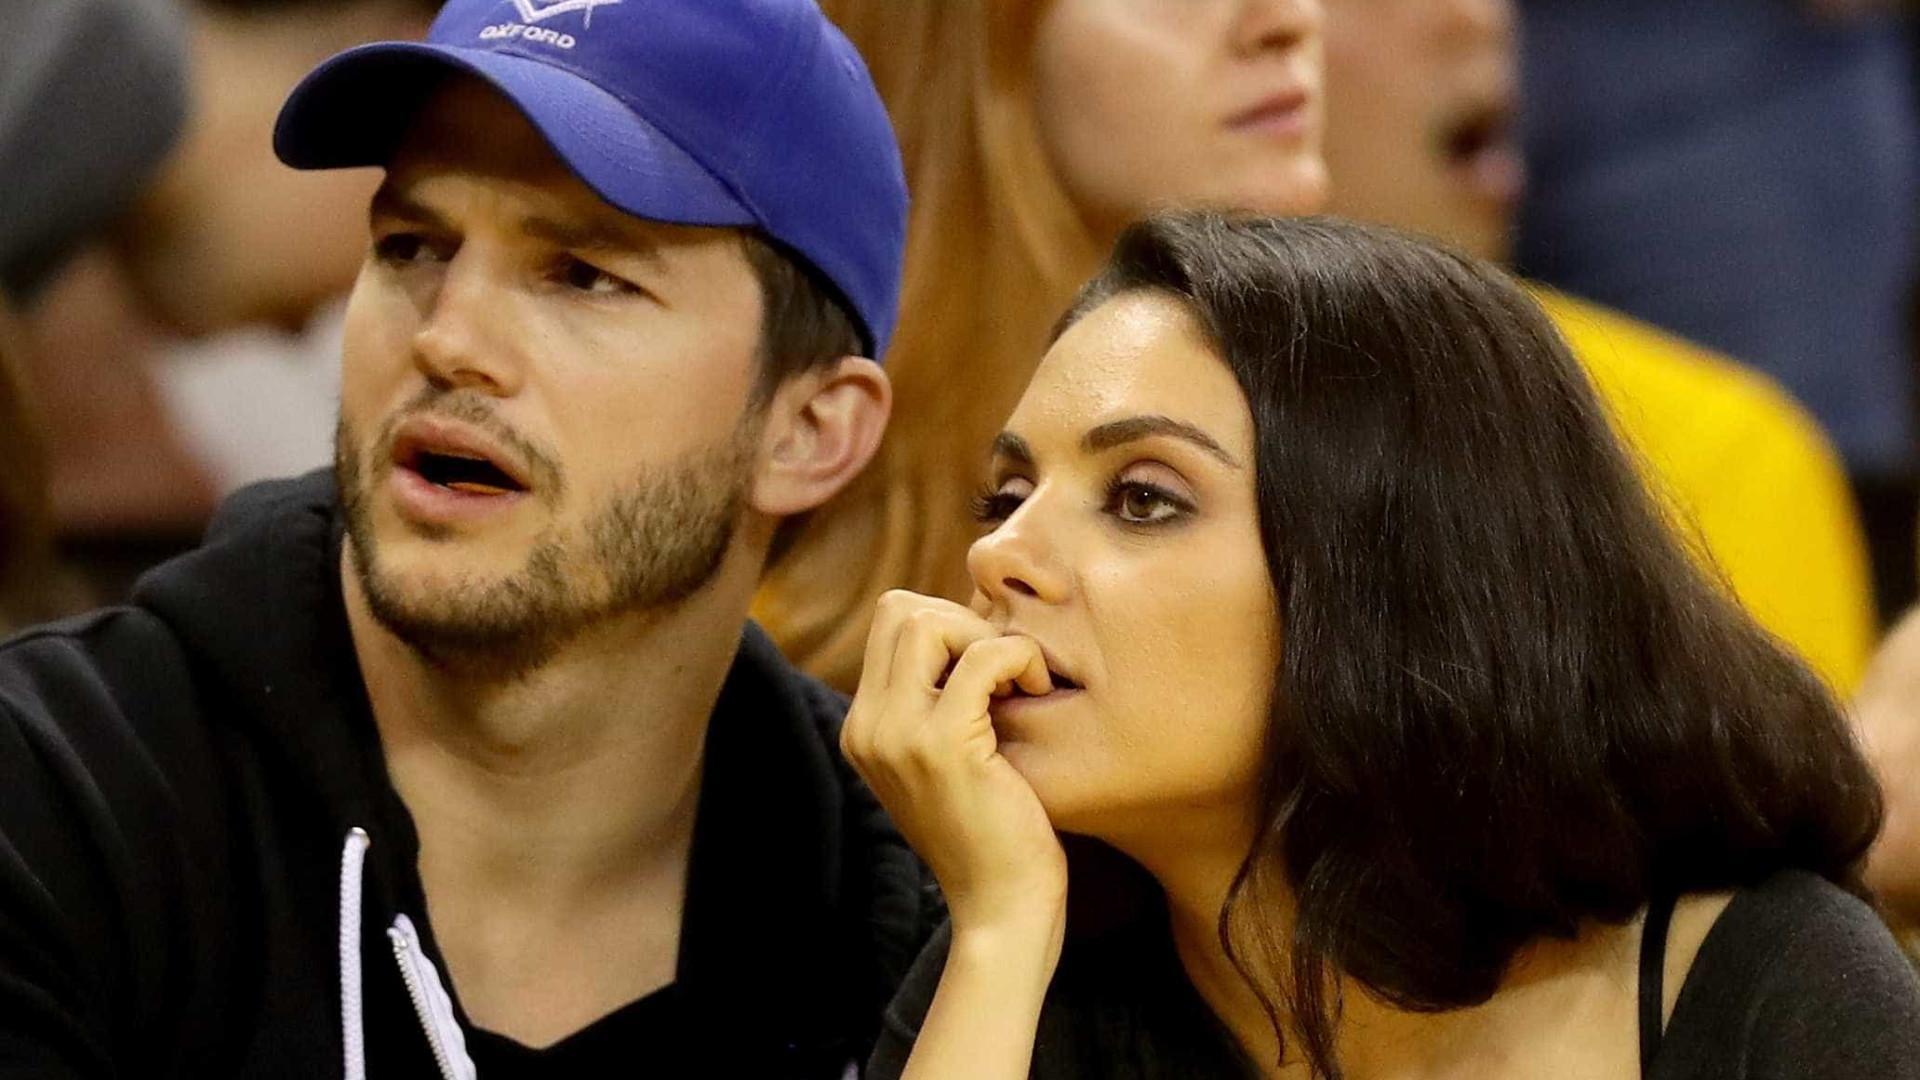 Ashton Kutcher pensou que Mila Kunis estivesse vendo pornô, mas era 'Bridgerton'